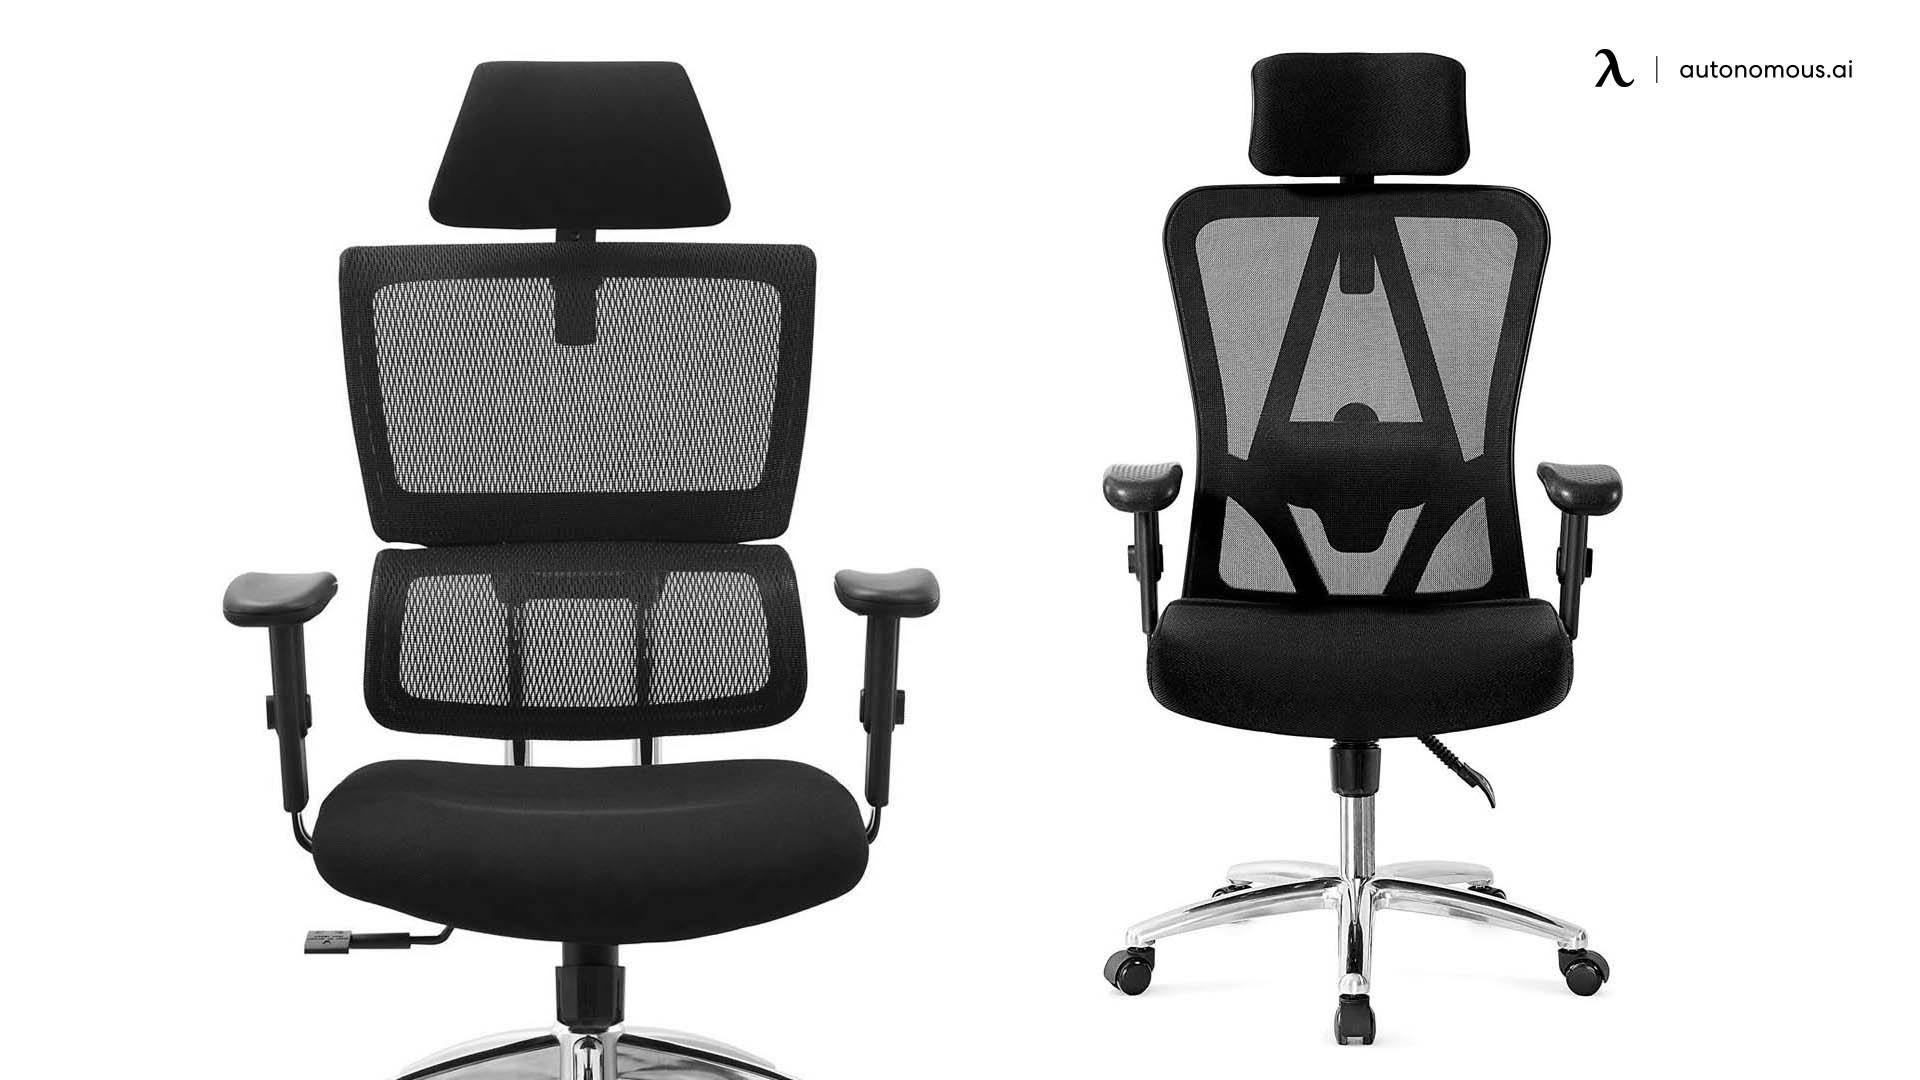 Tivoca Ergonomic Chair